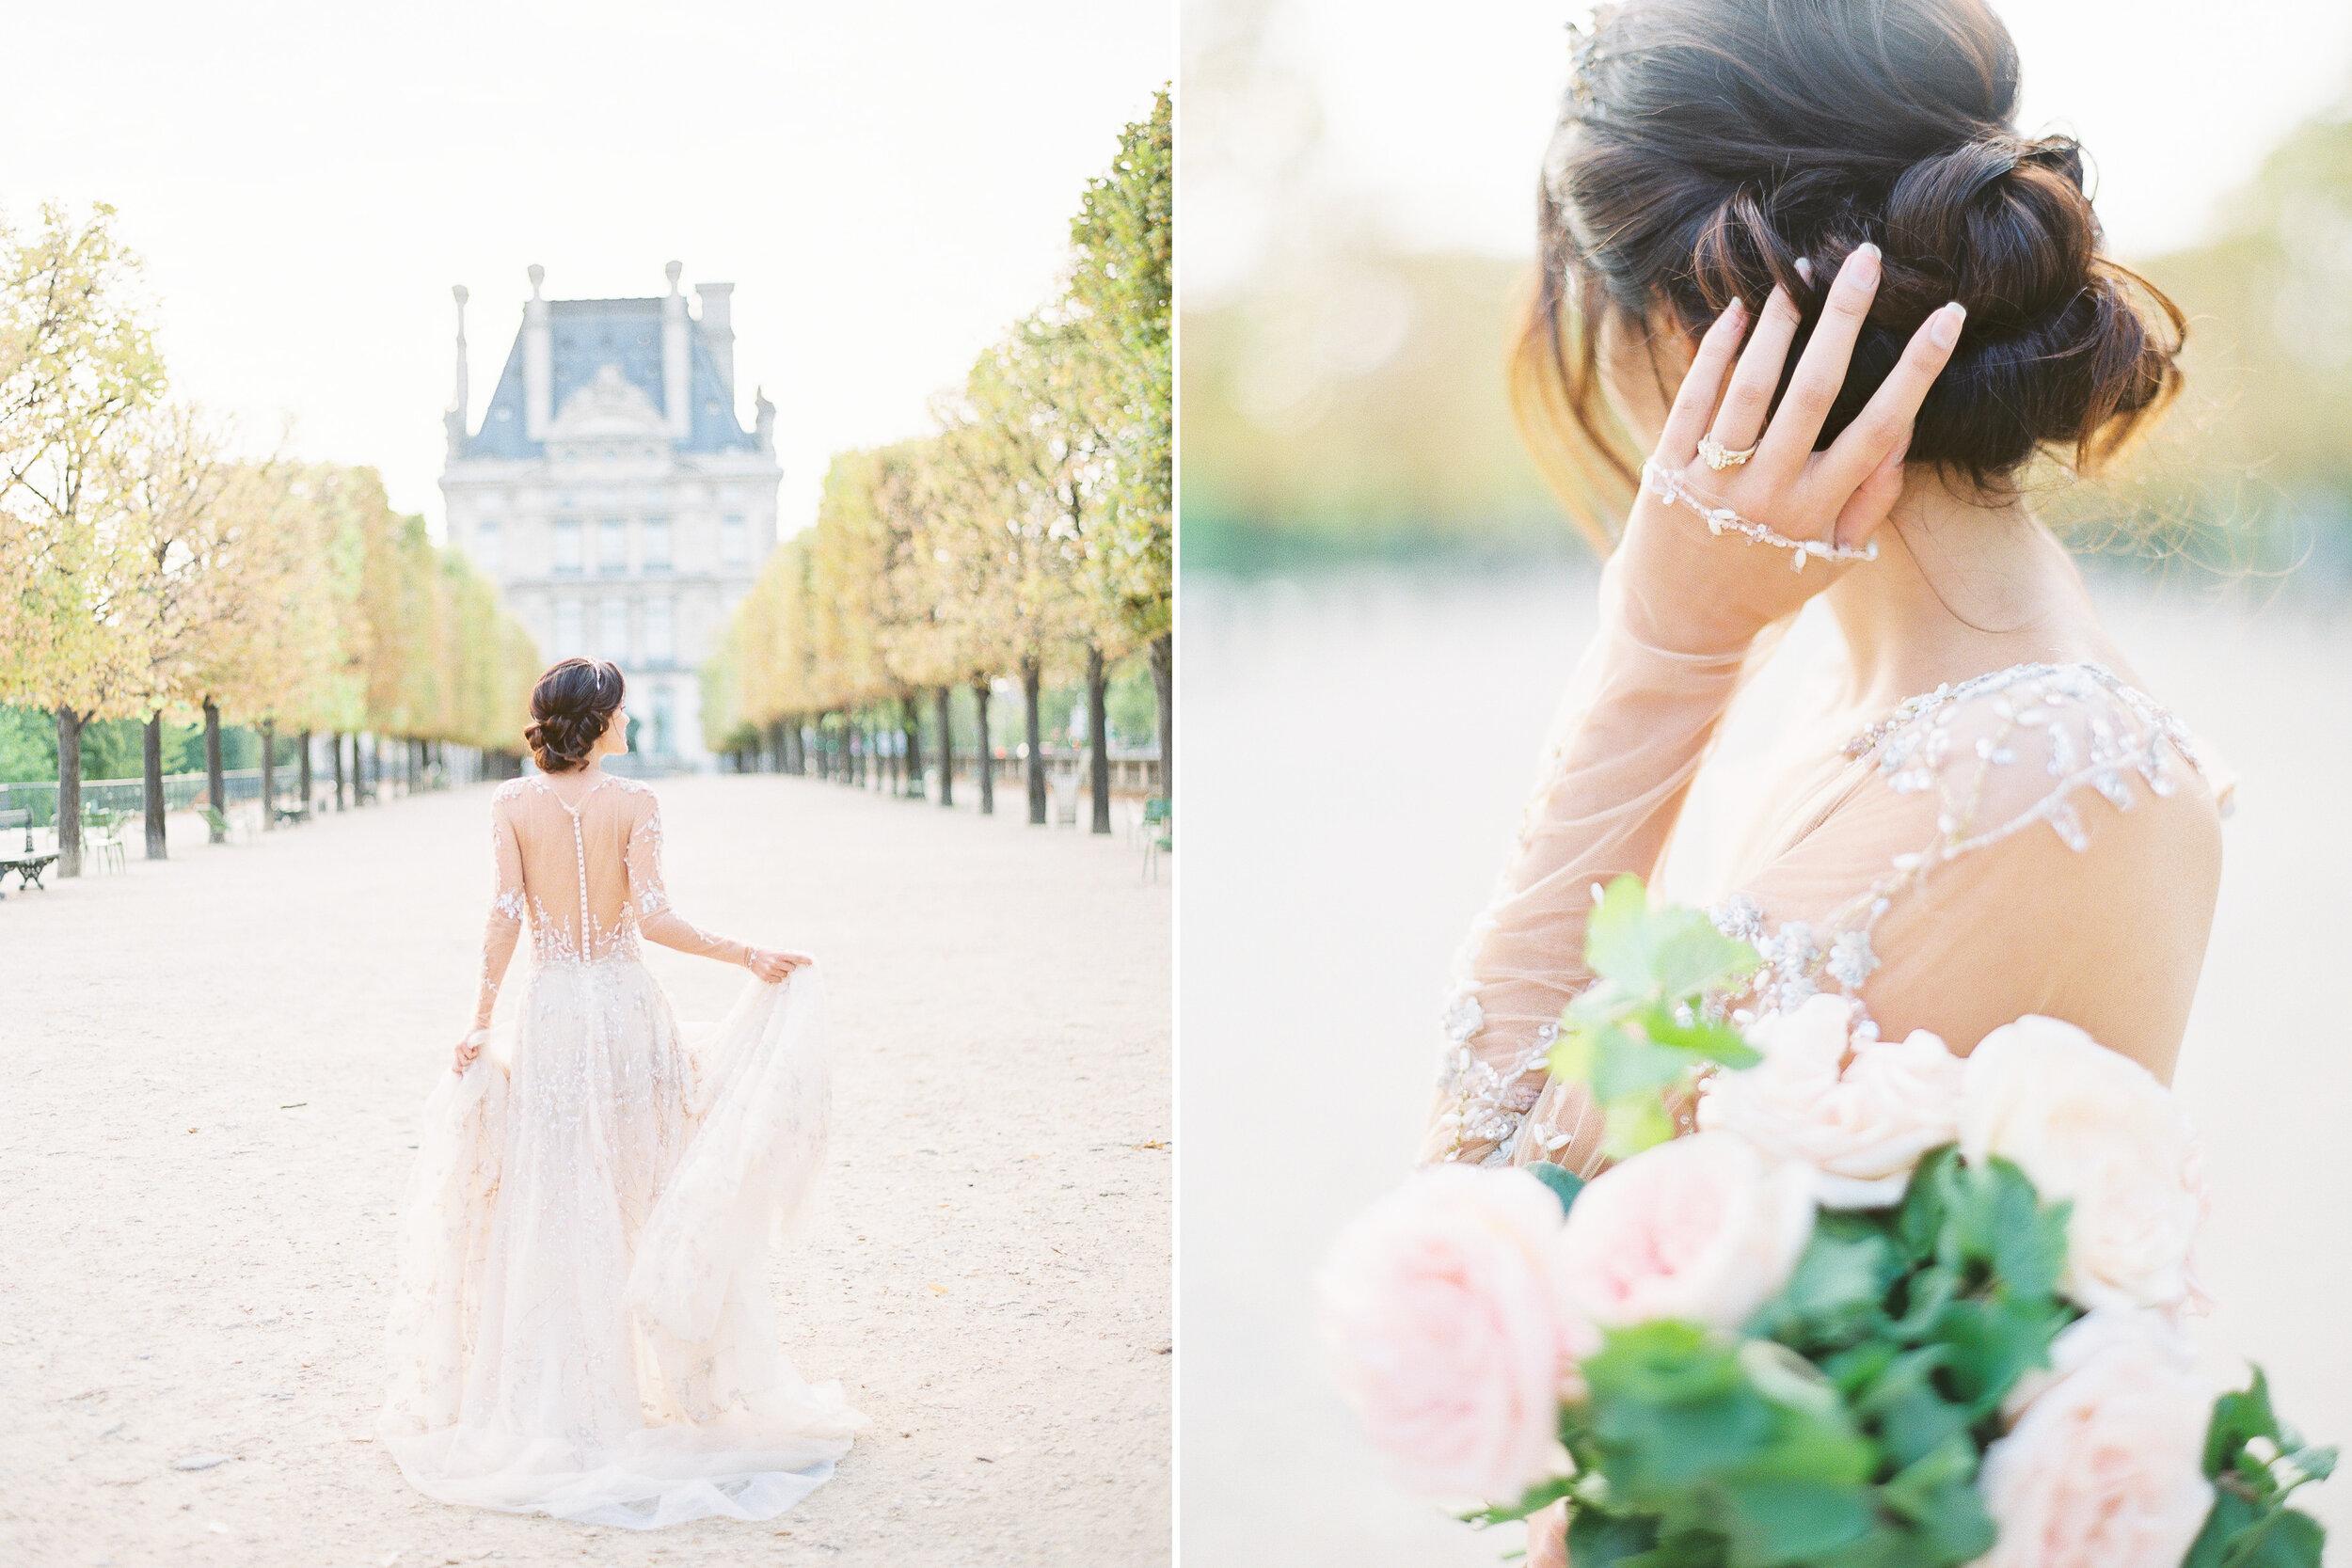 RachelOwensPhotography - ParisWeddingInspiration - 2.jpg